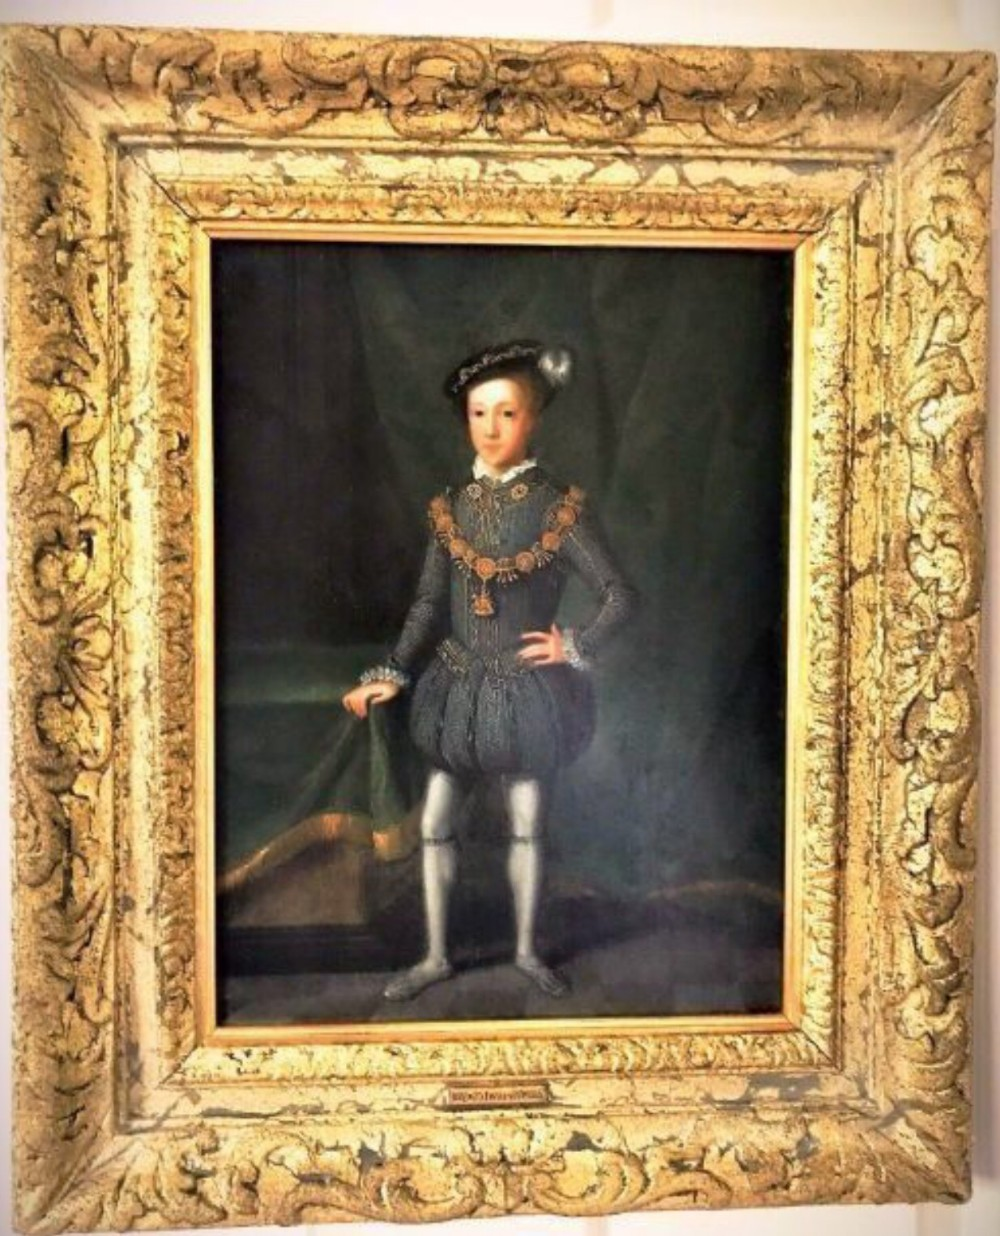 king edward vi 15371553 17thc dutch oil portrait painting on oak panel